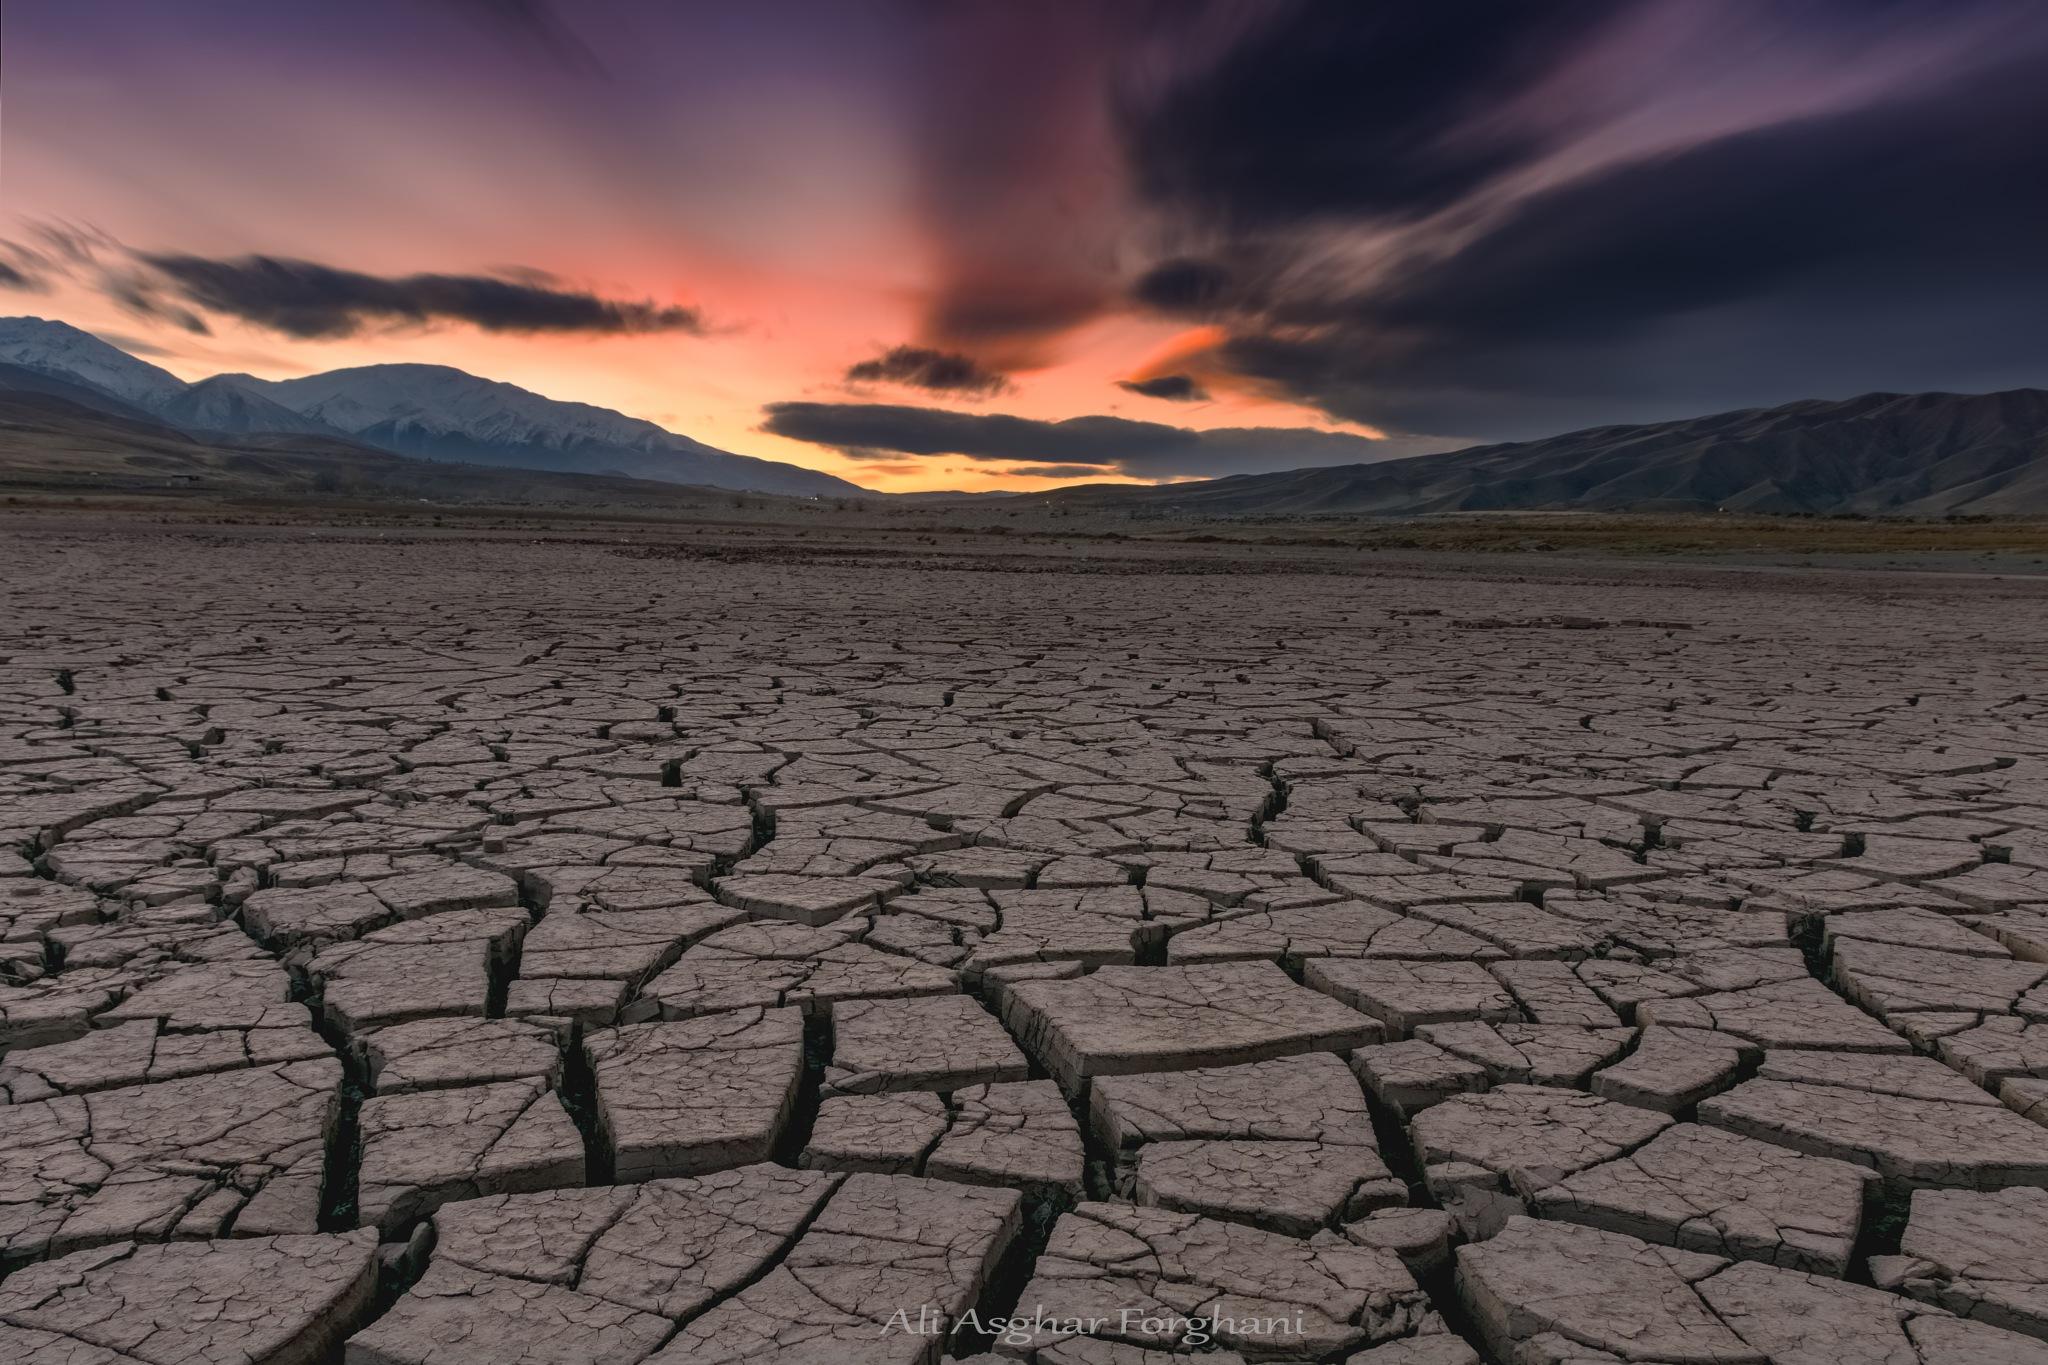 Thirsty by asghar_forghanı